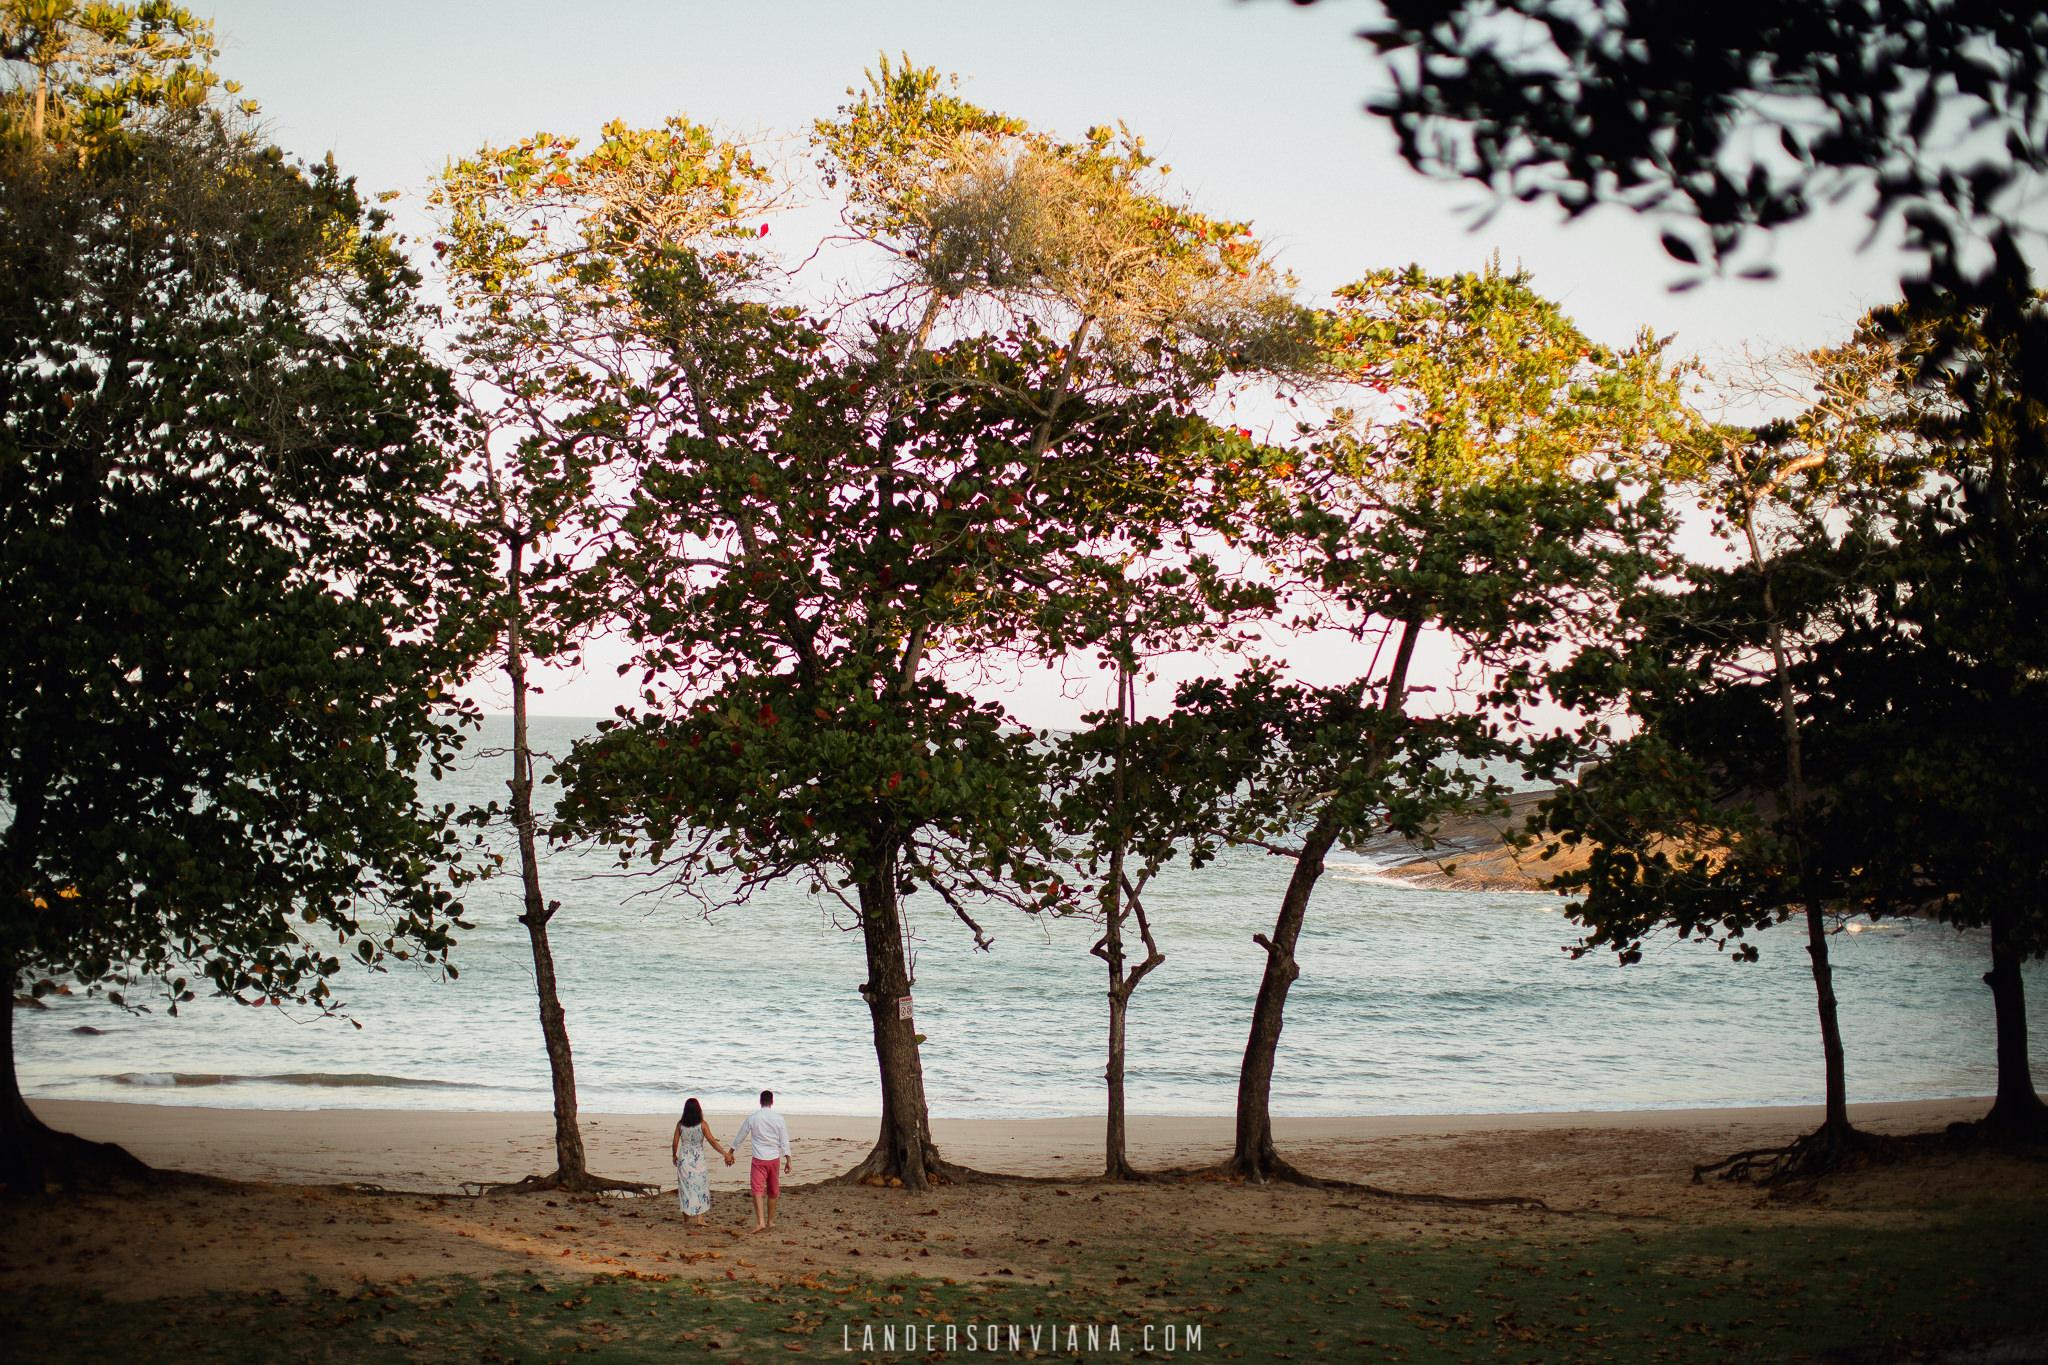 ensaio-pre-wedding-praia-landerson-viana-fotografia-casamento-pegueiobouquet-5.jpg